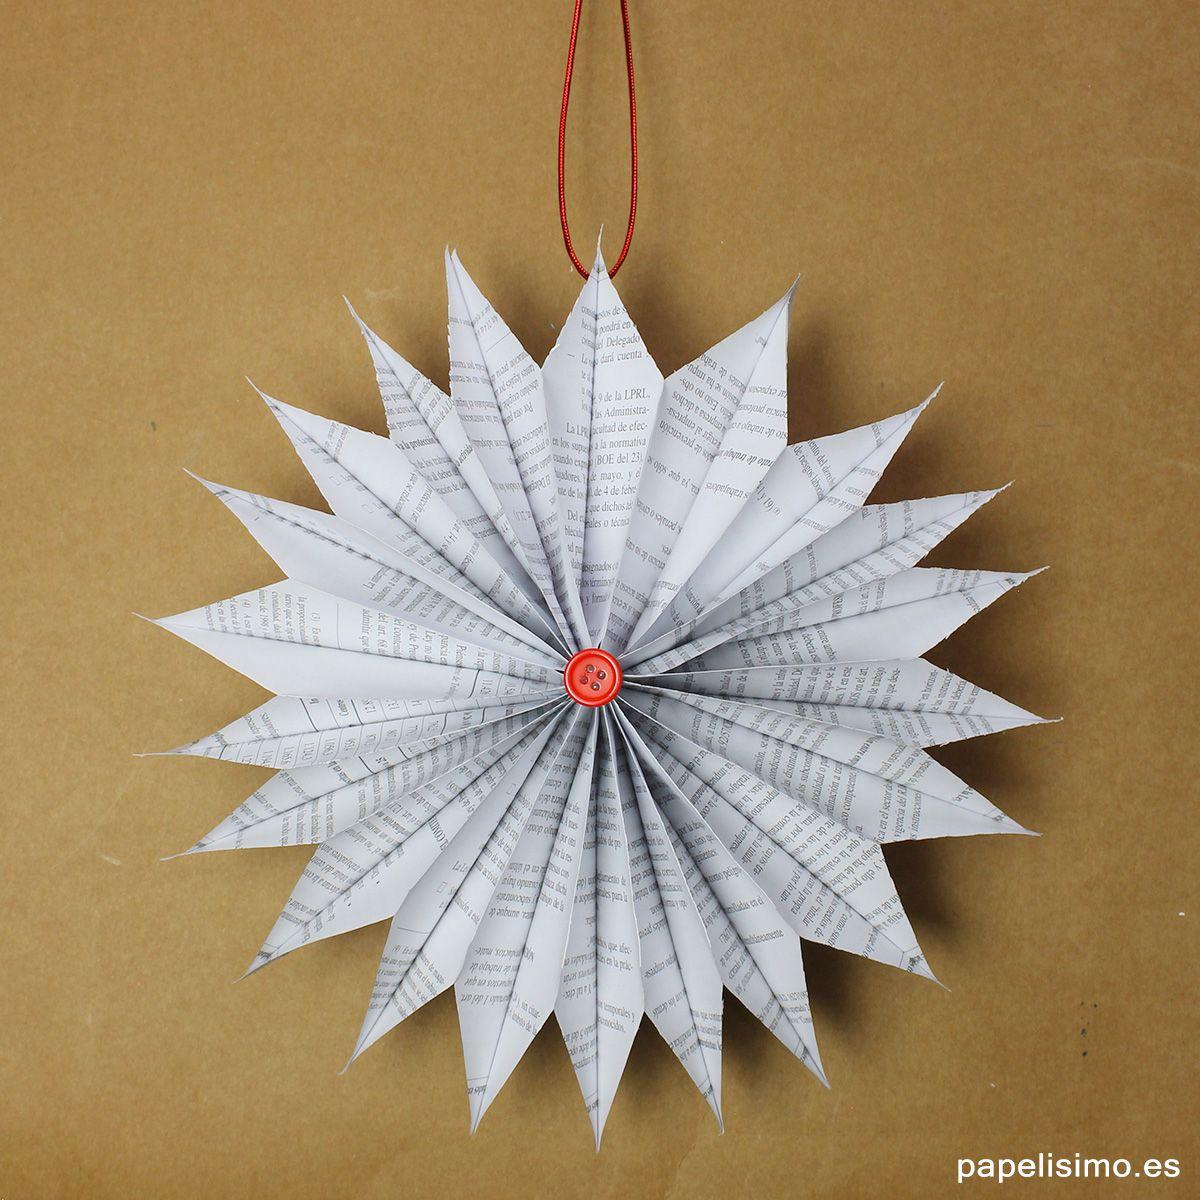 Adornos navidenos con papel periodico diy paper christmas - Adornos de navidad con papel ...